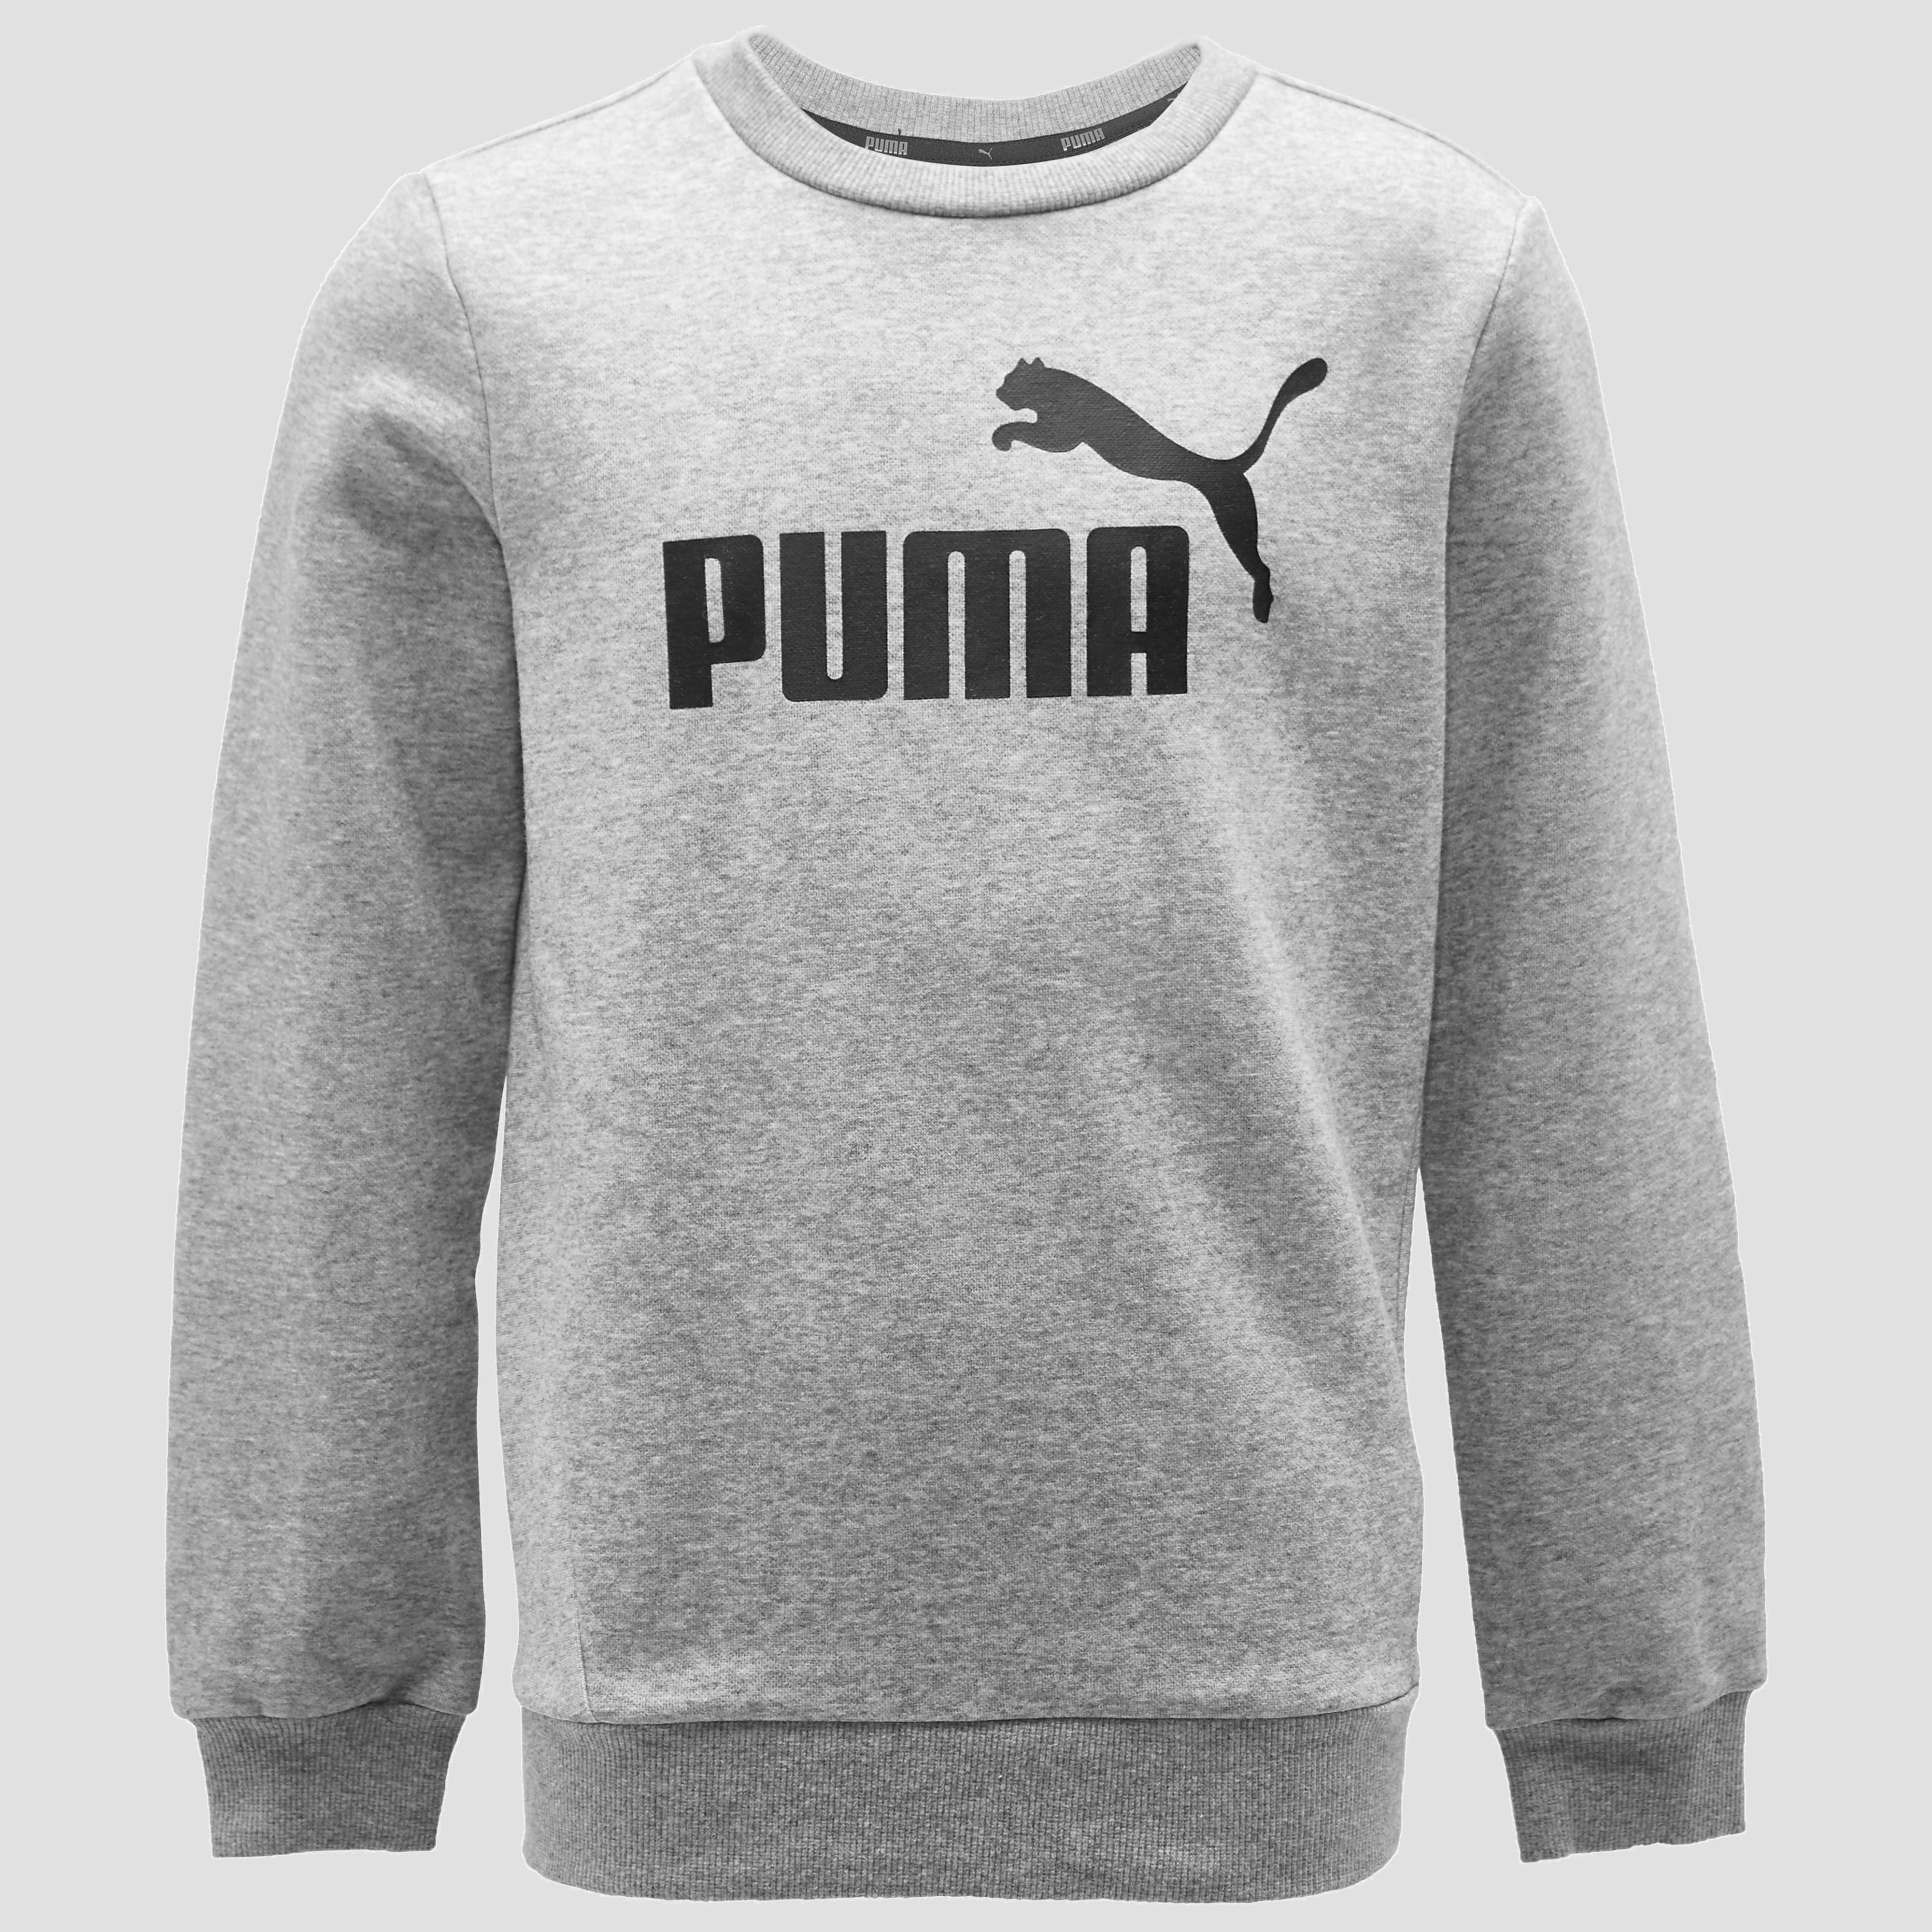 PUMA NO. 1 LOGO SWEATER JONGENS